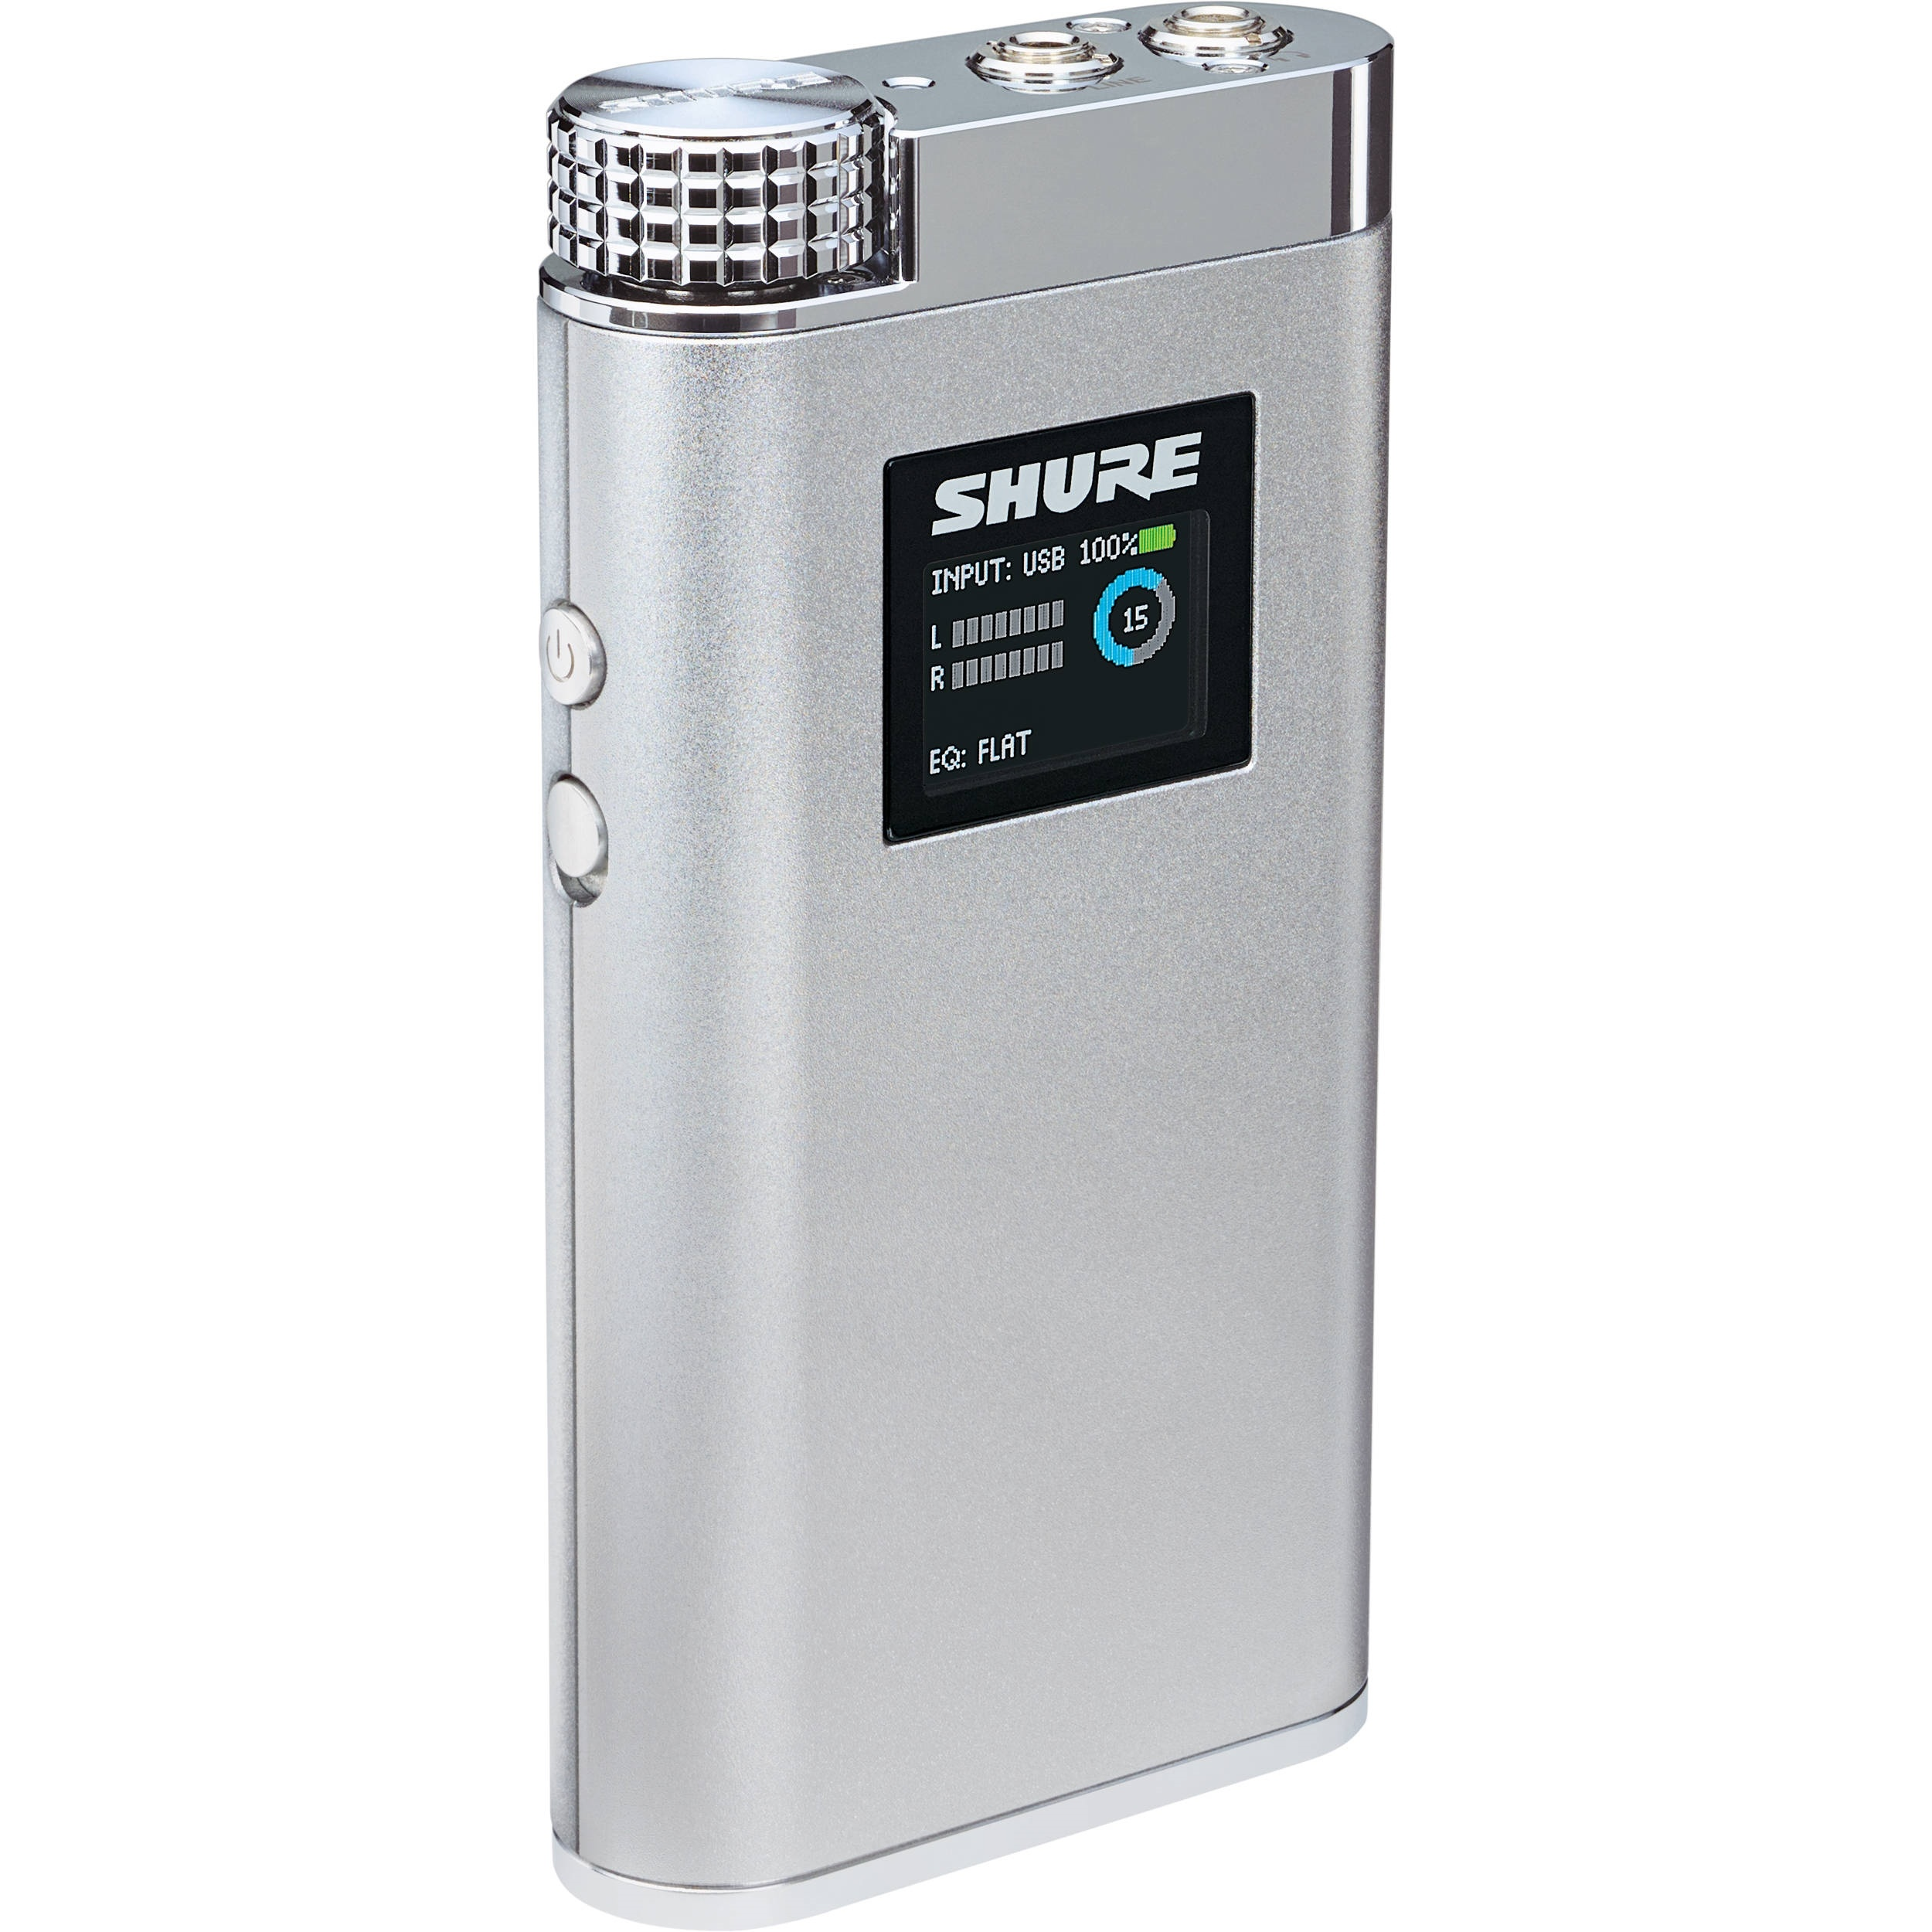 Shure SHA900 - Portable Listening Amplifier